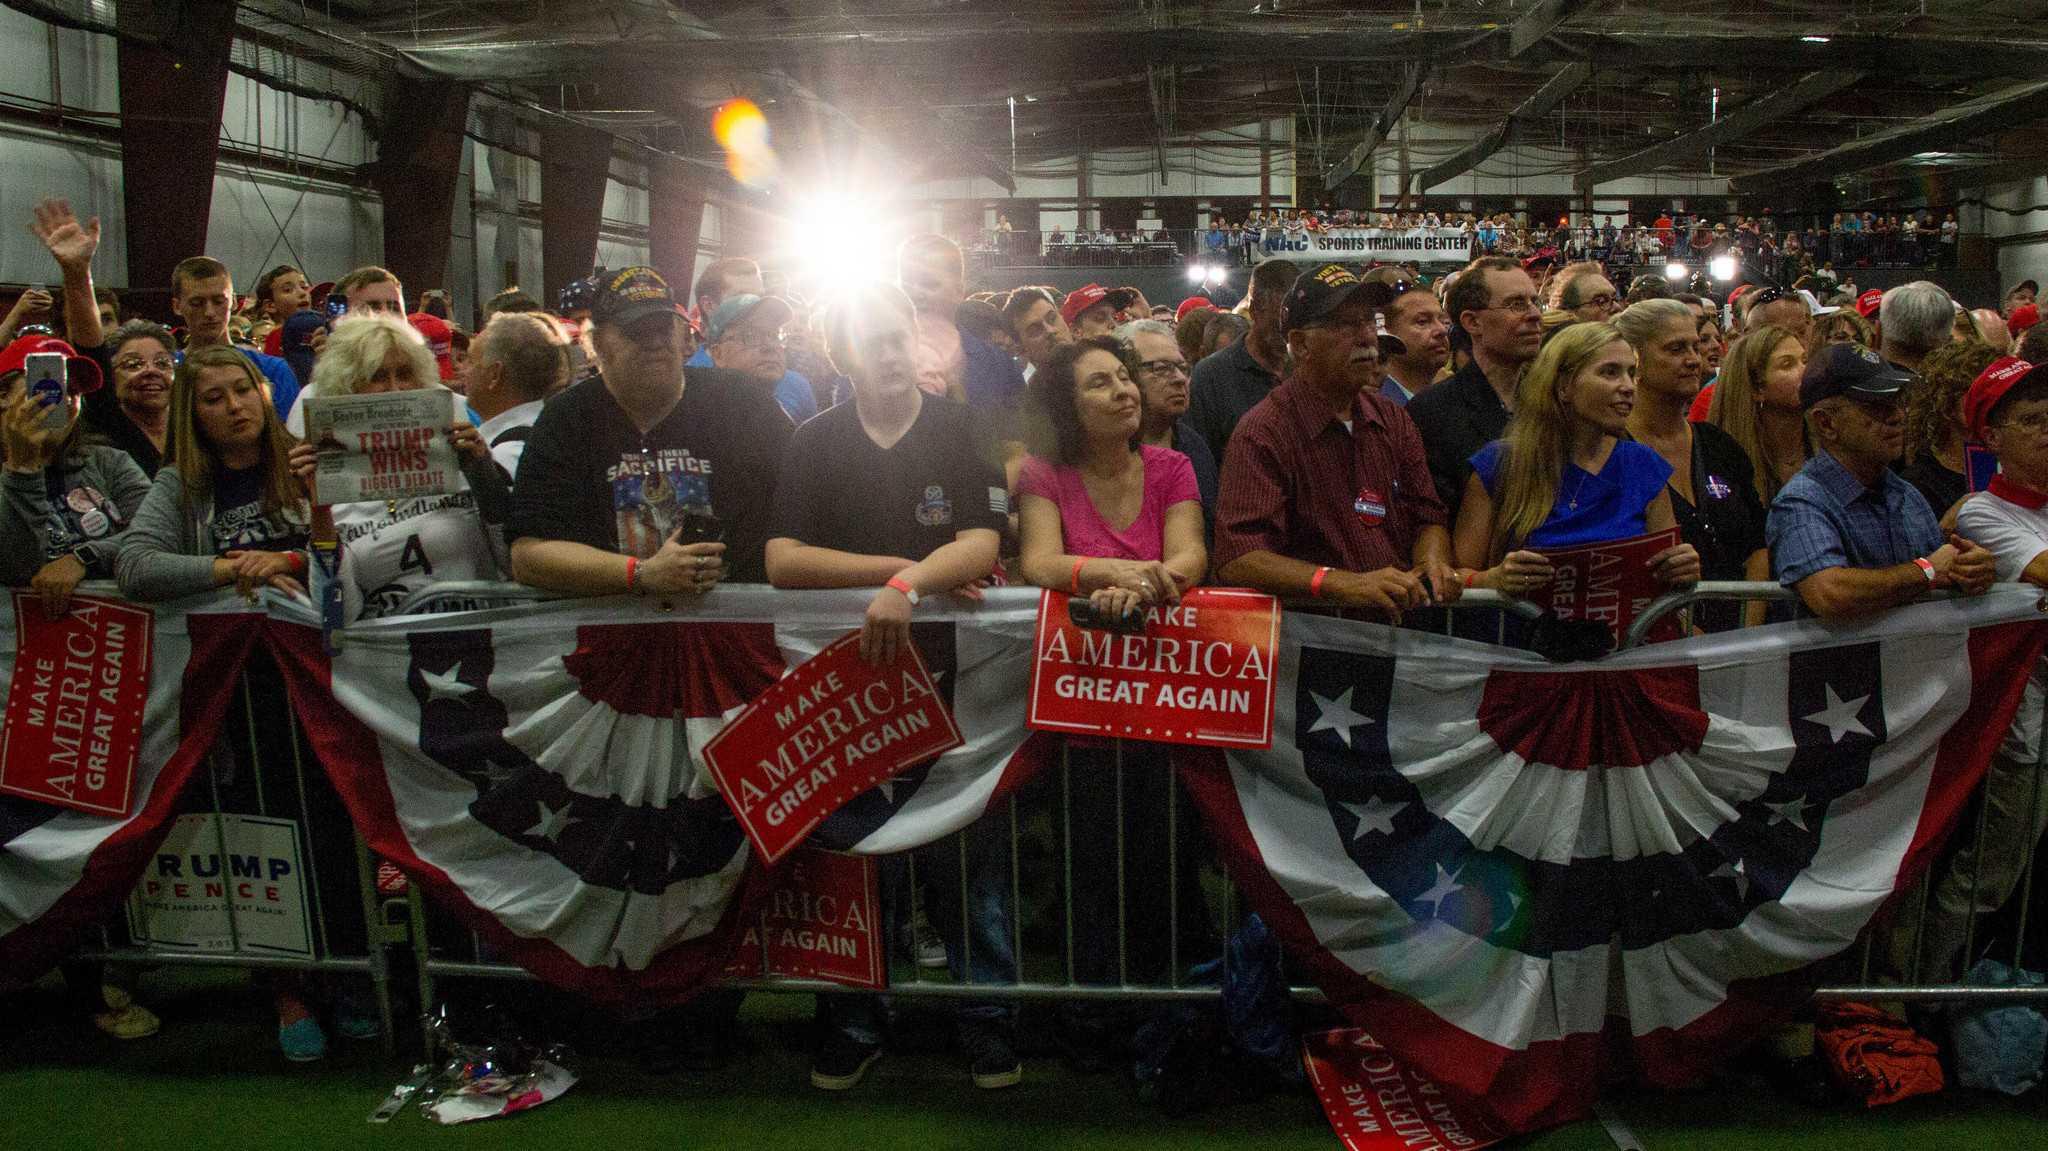 US-Wahl: Nachzählung in Pennsylvania beantragt, Michigan soll folgen